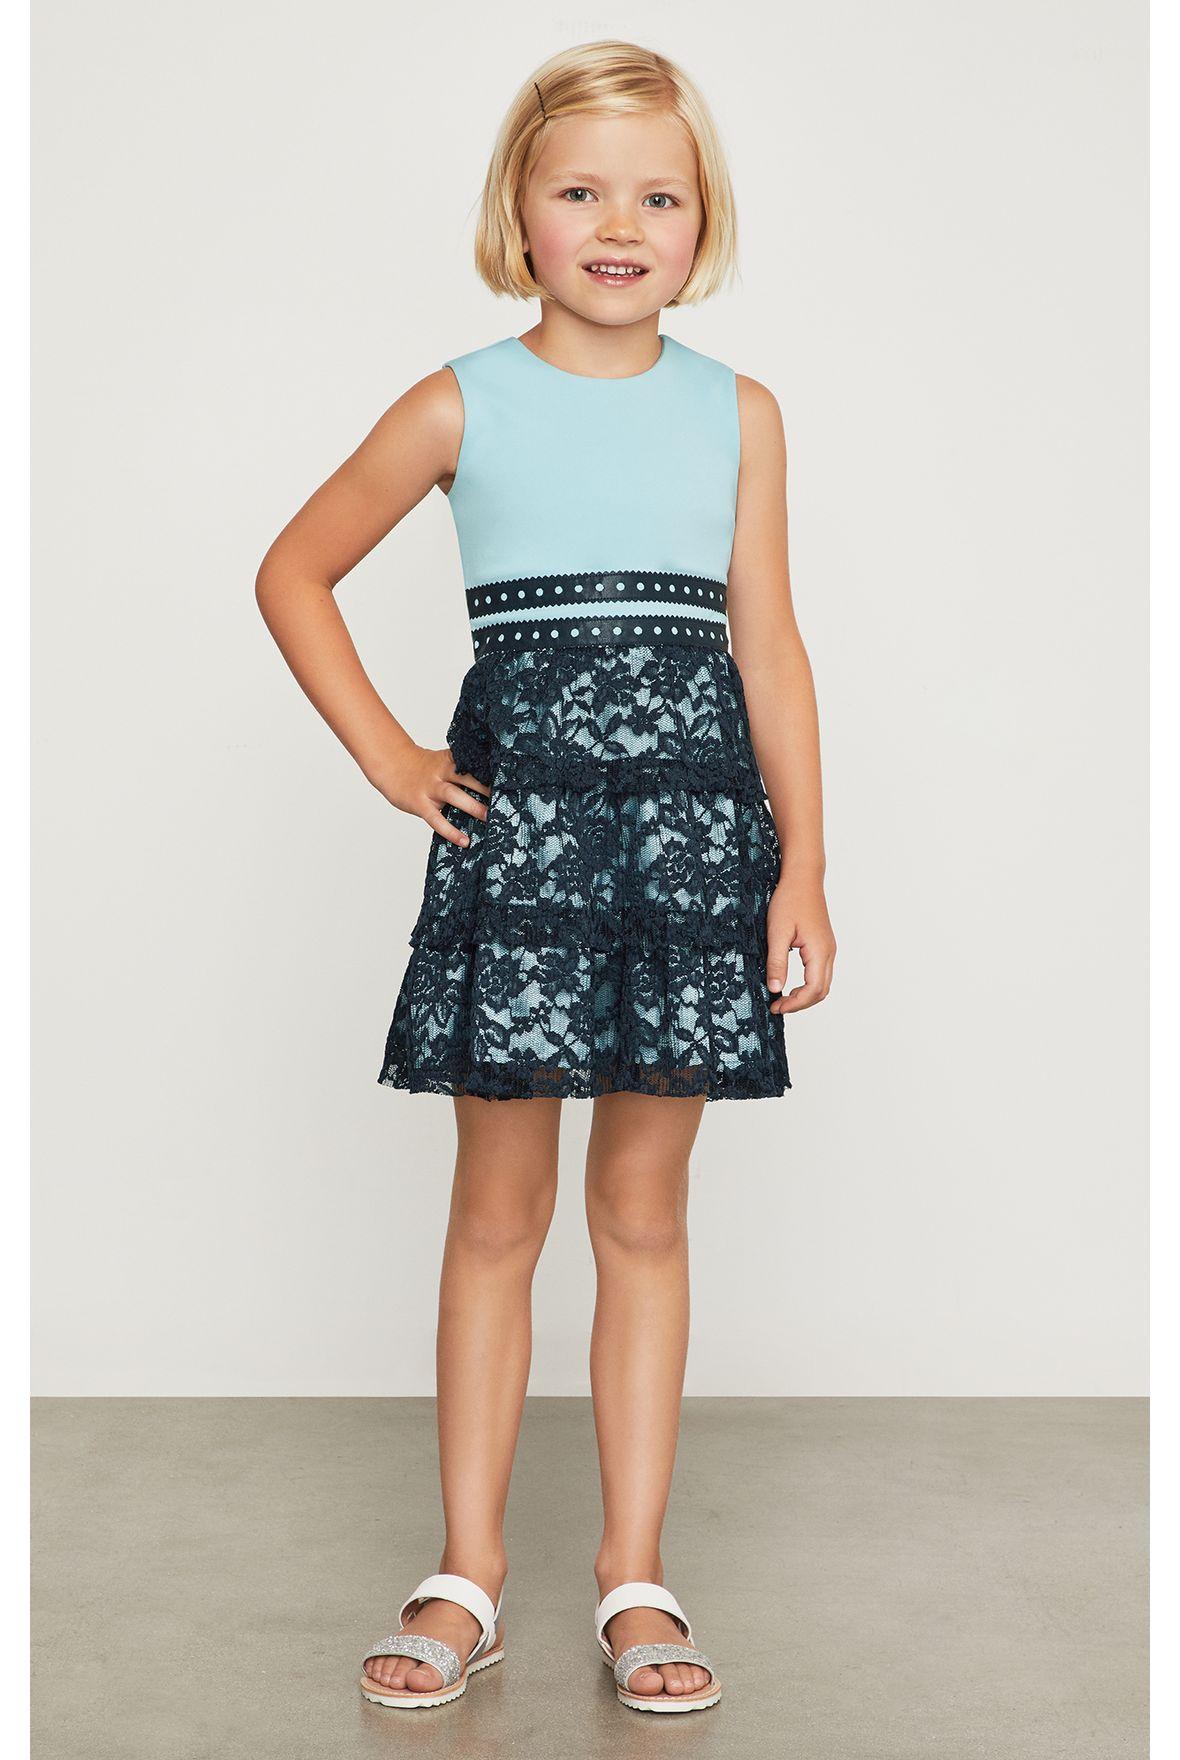 Vestido-BCBGirls-azul-con-encaje-B638DR196_SKL_b